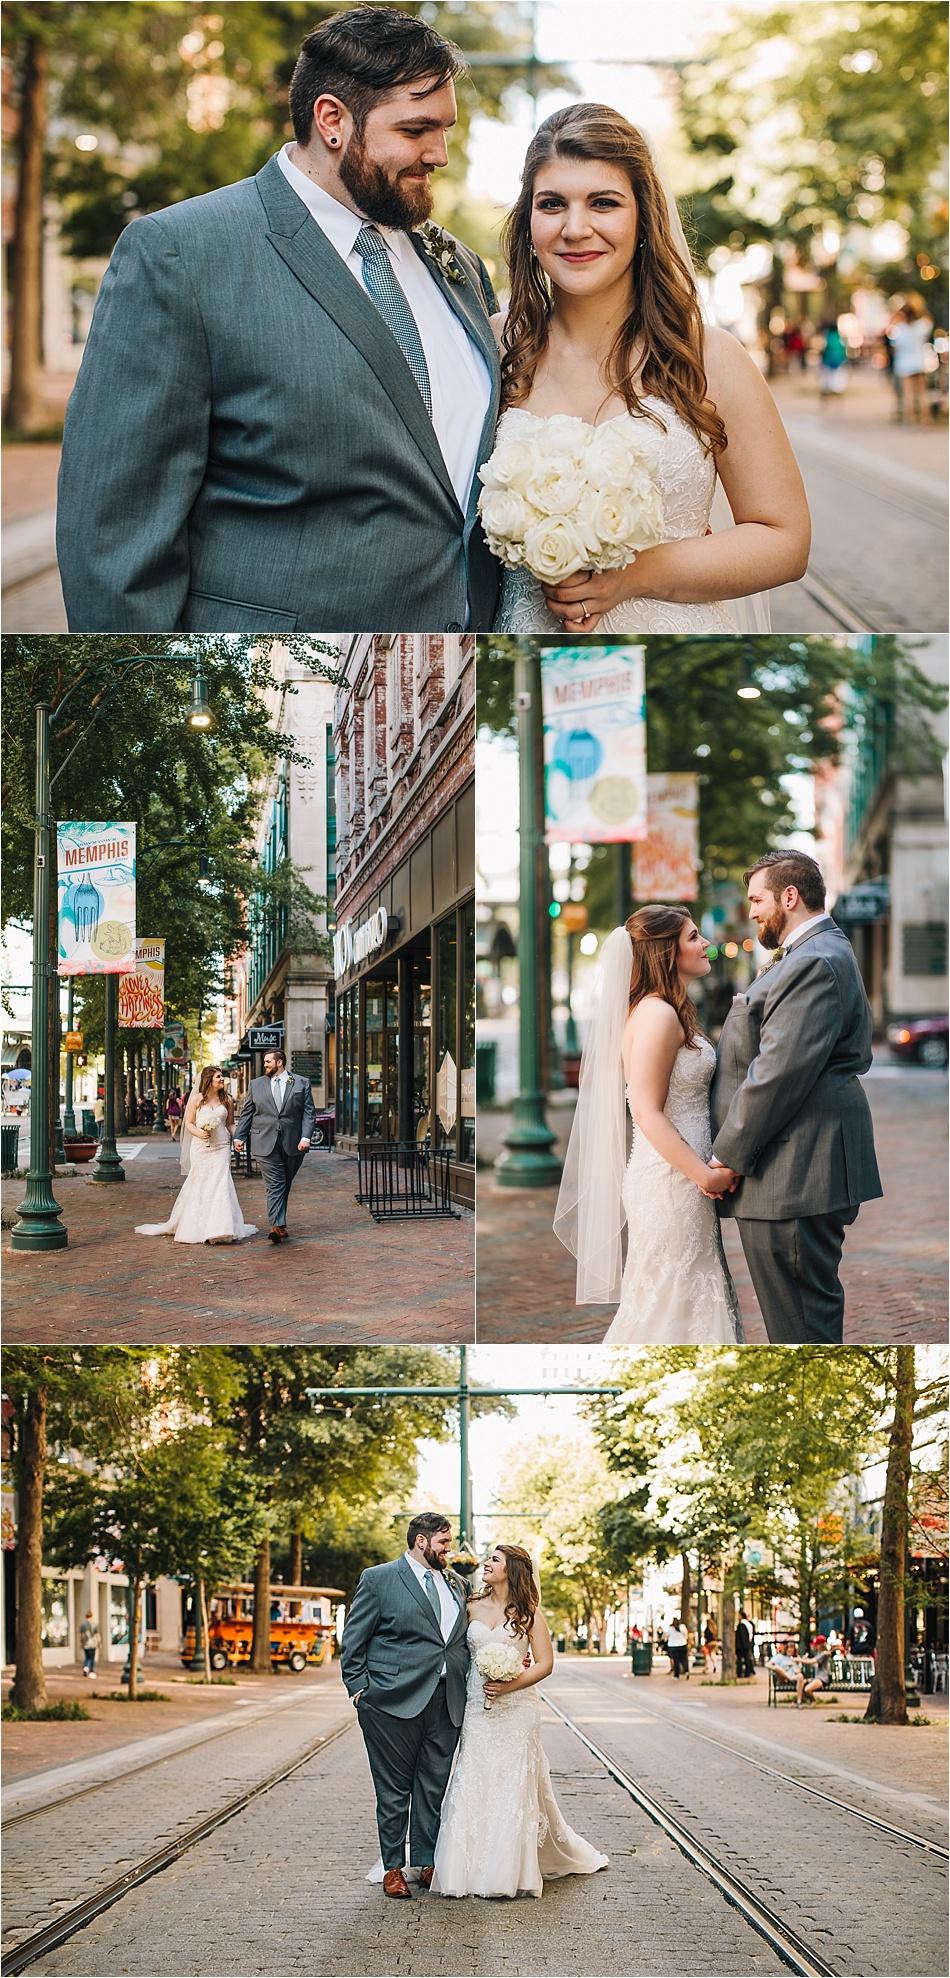 CK-Photo-Nashville-Wedding-Photographer-_0014.jpg